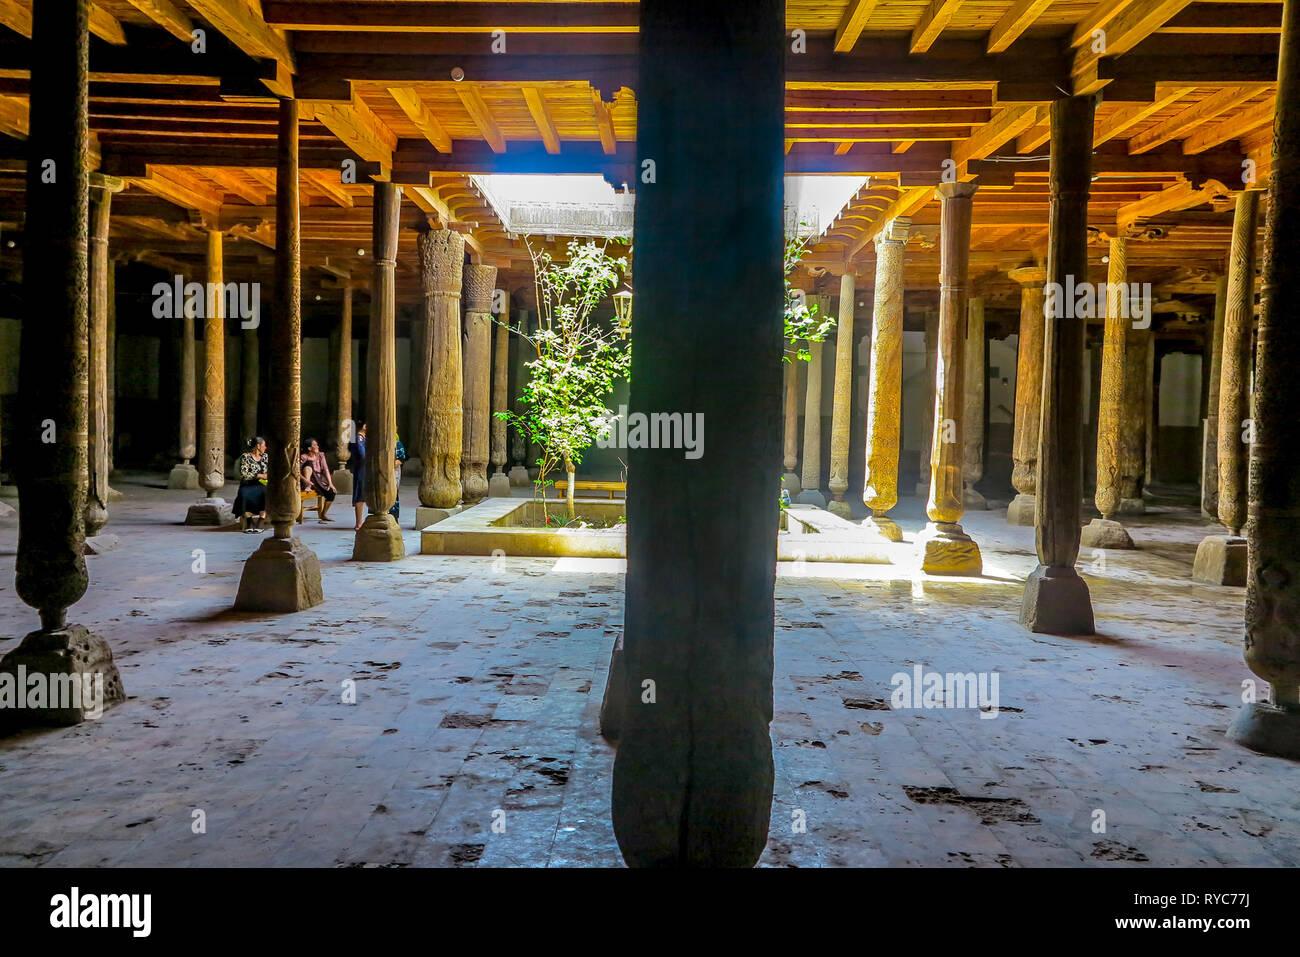 Khiva Old Town Juma Mosque Interior Wooden Columns at Prayers Hall - Stock Image